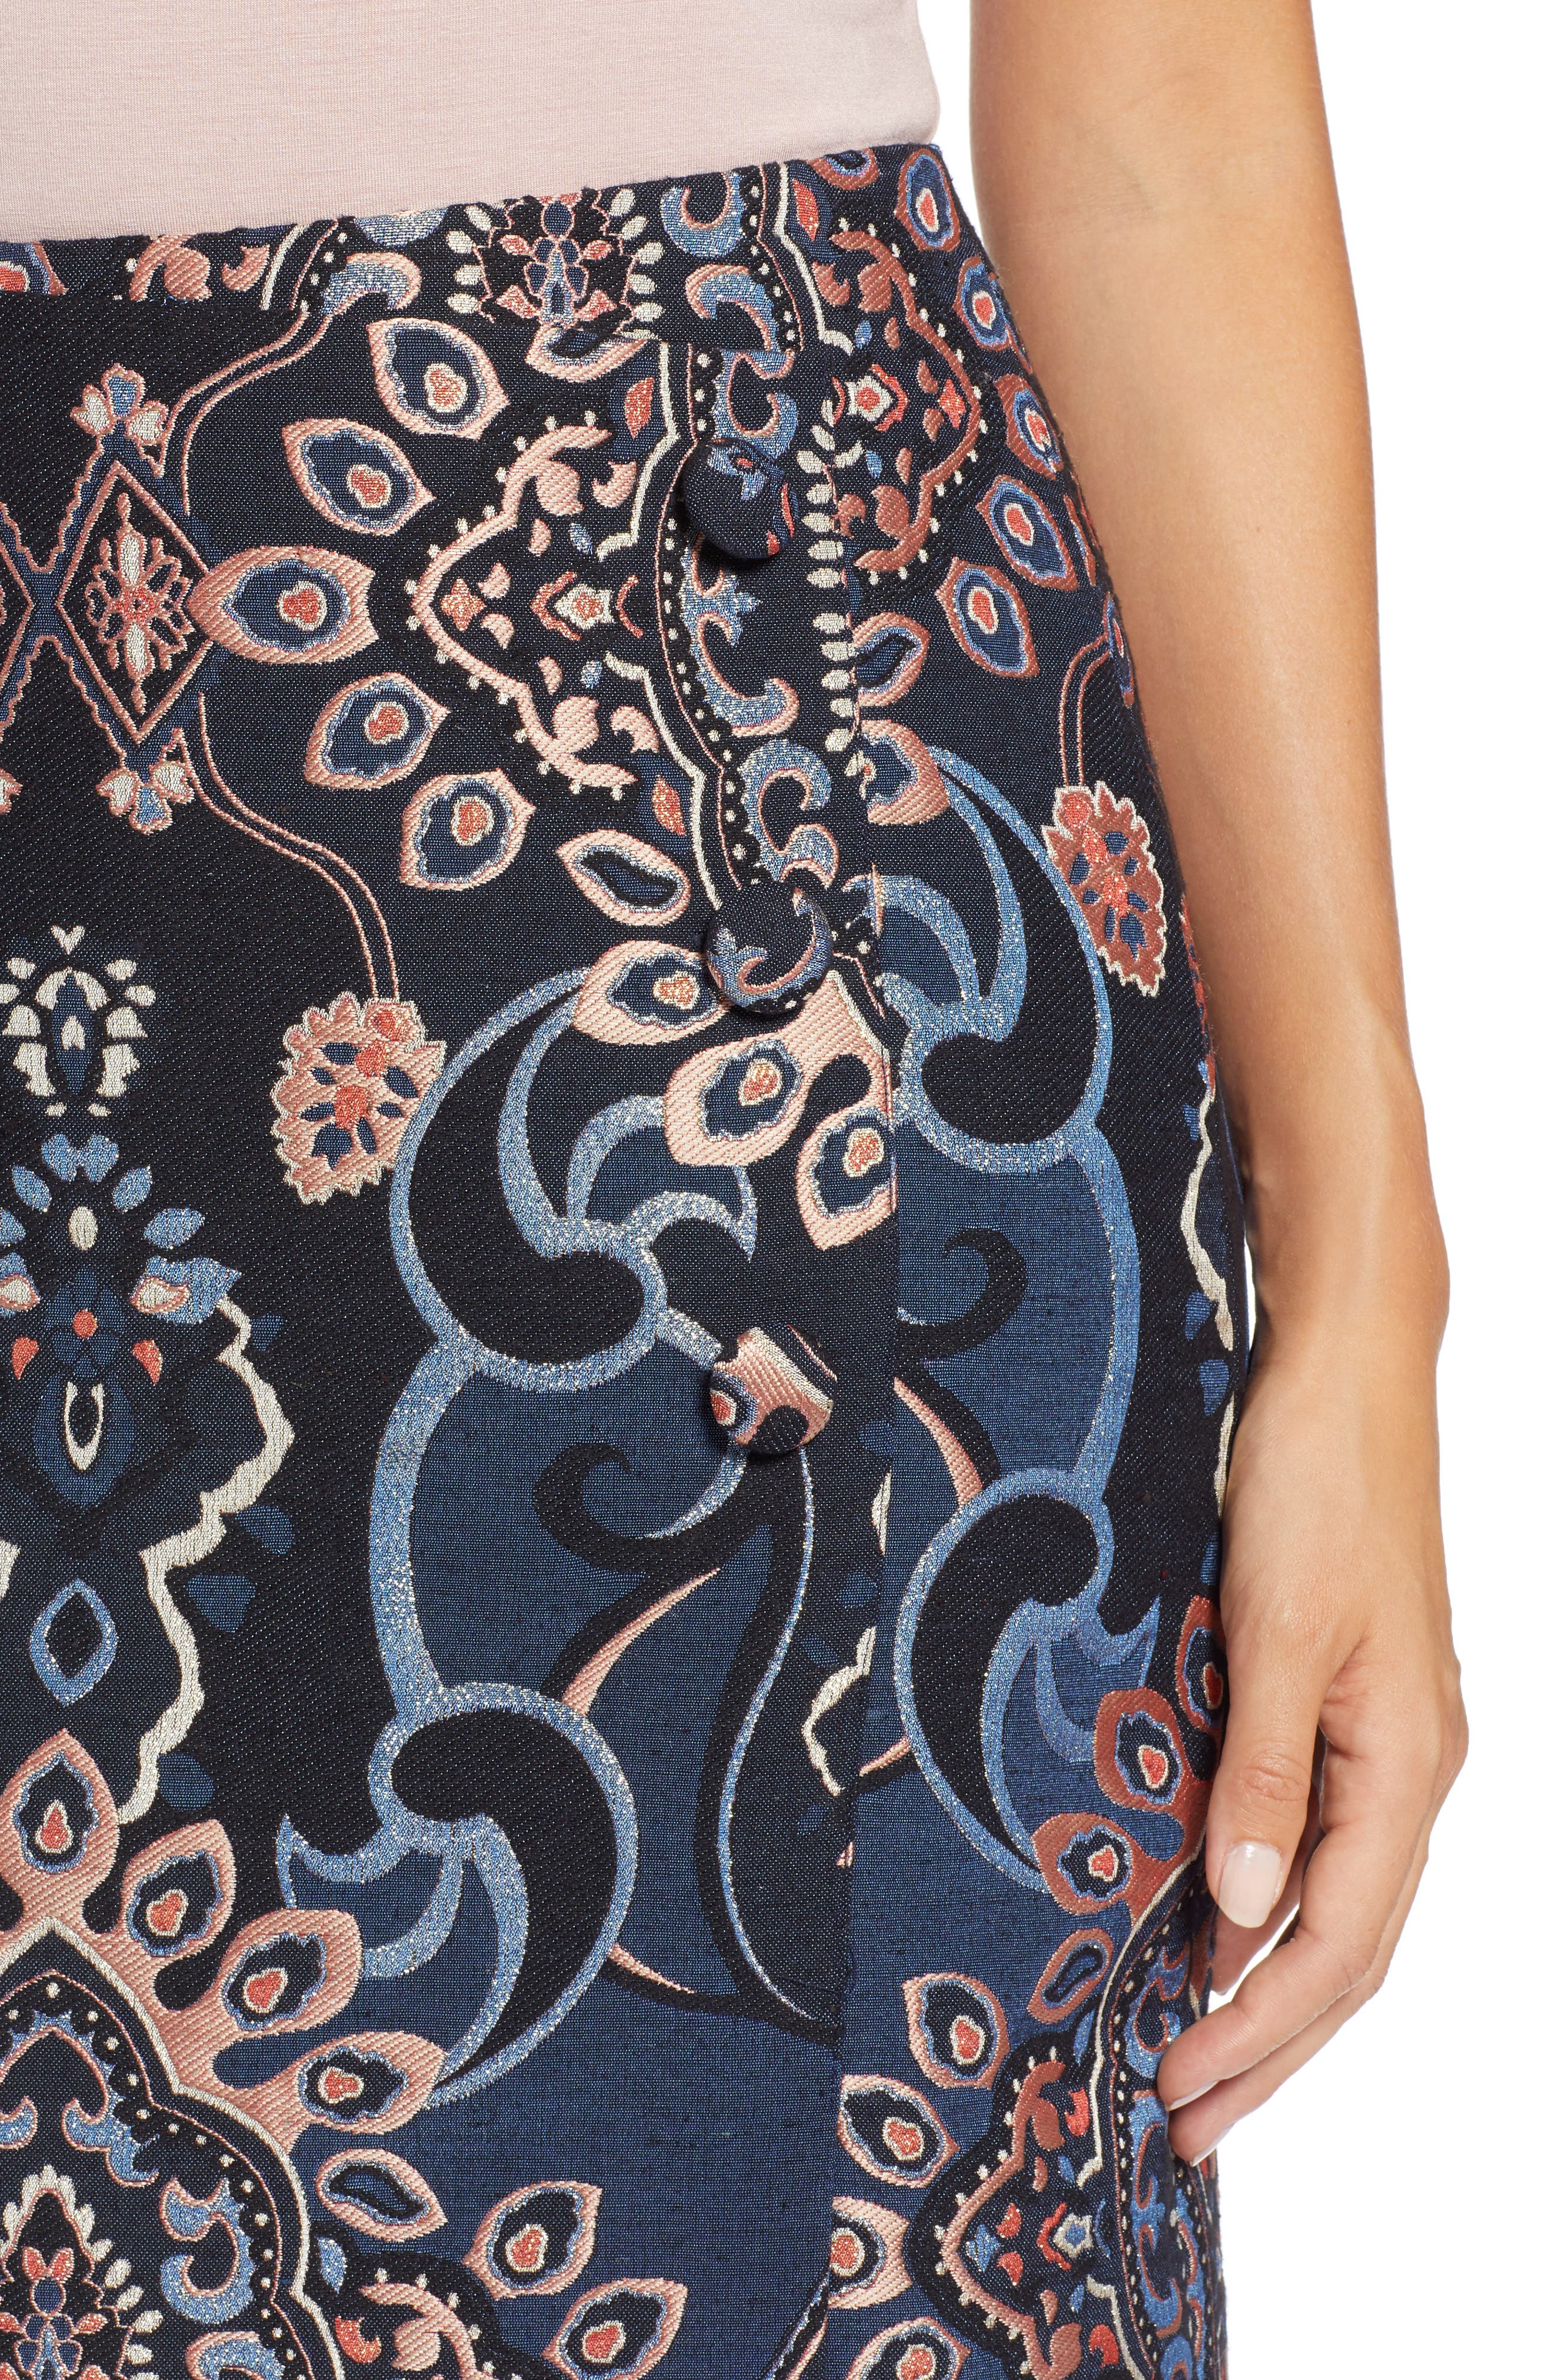 Button Detail Skirt,                             Alternate thumbnail 4, color,                             NAVY MULTI BROCADE